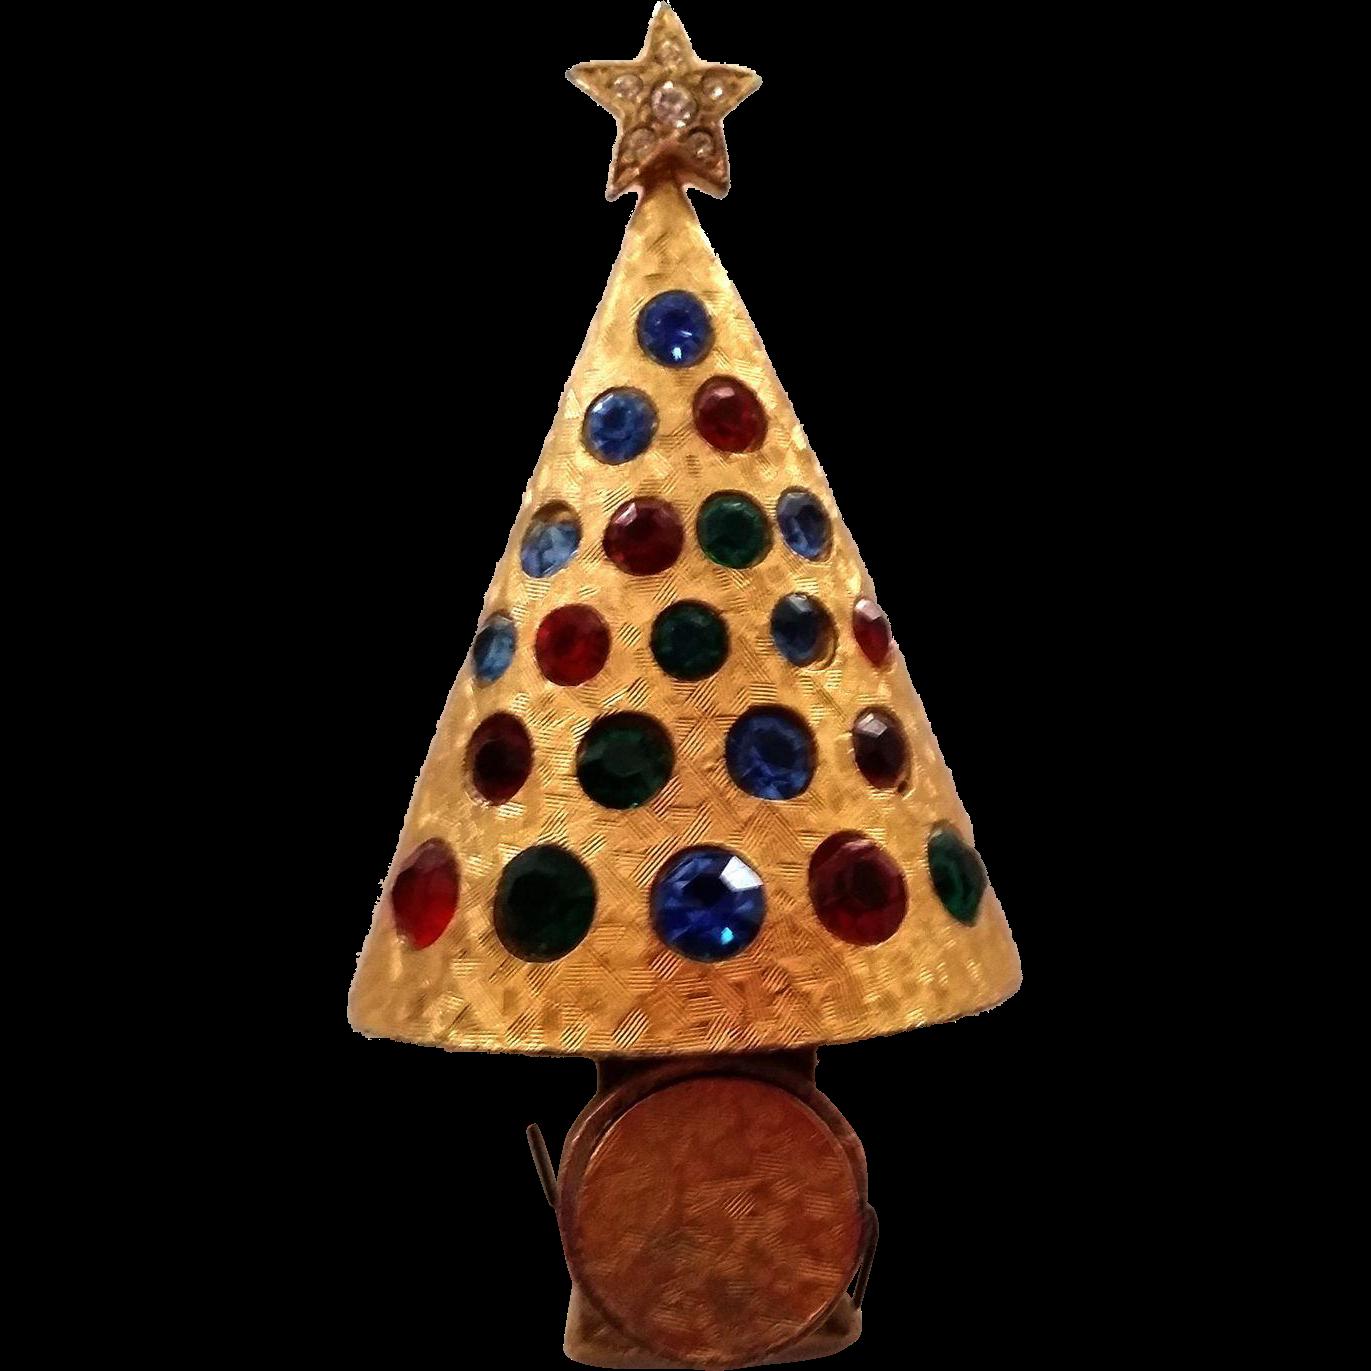 Hattie Carnegie Light Up Christmas Tree Pin 1960s